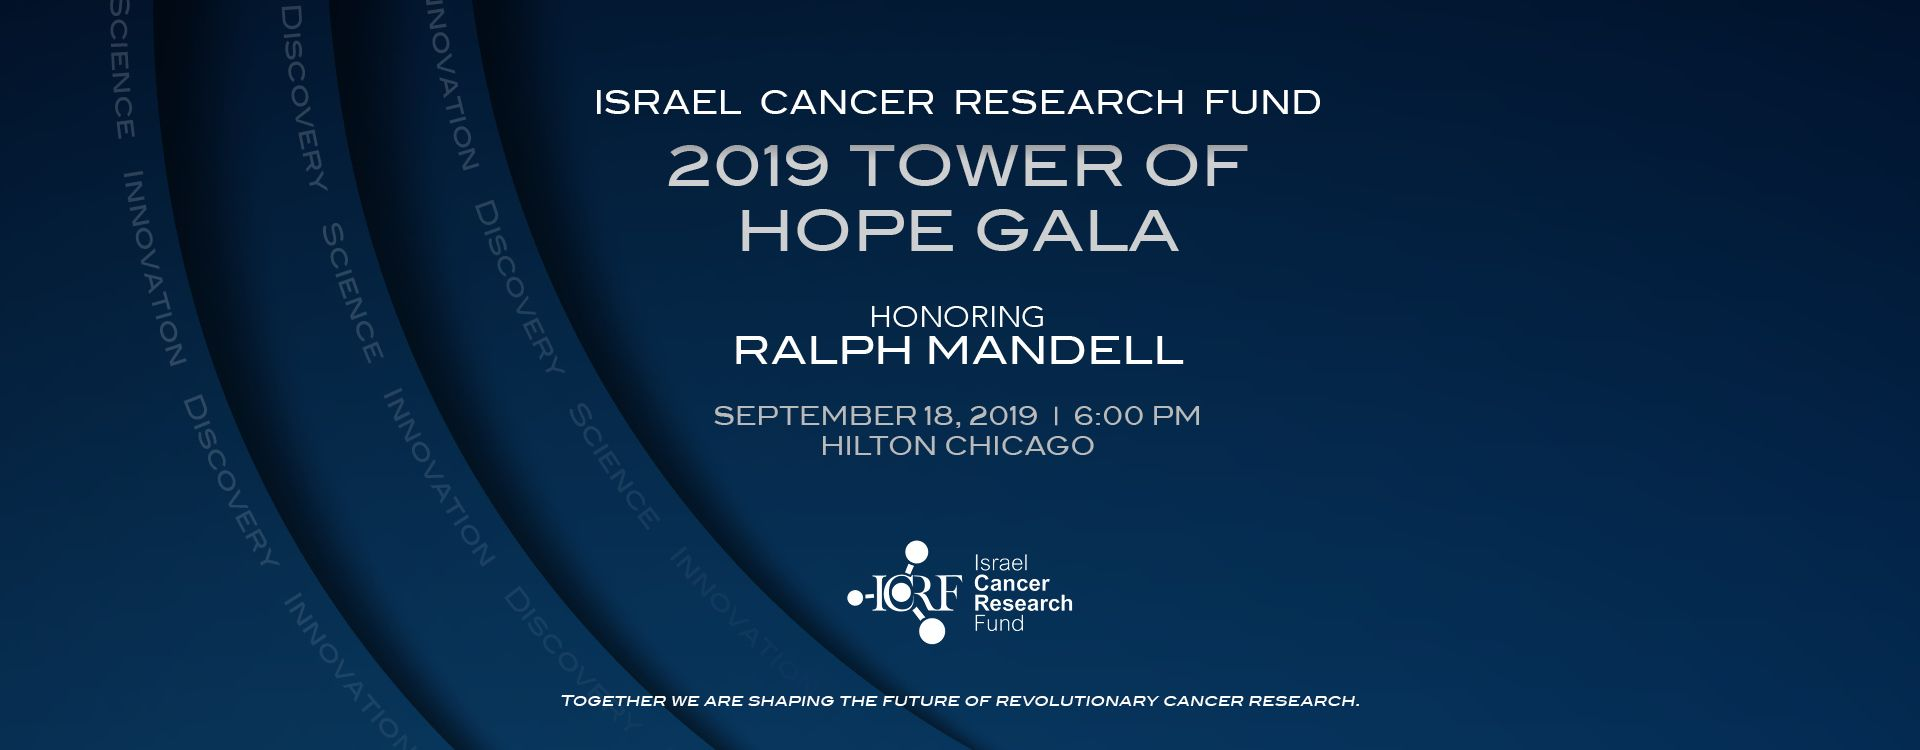 2019 ICRF Tower of Hope Gala